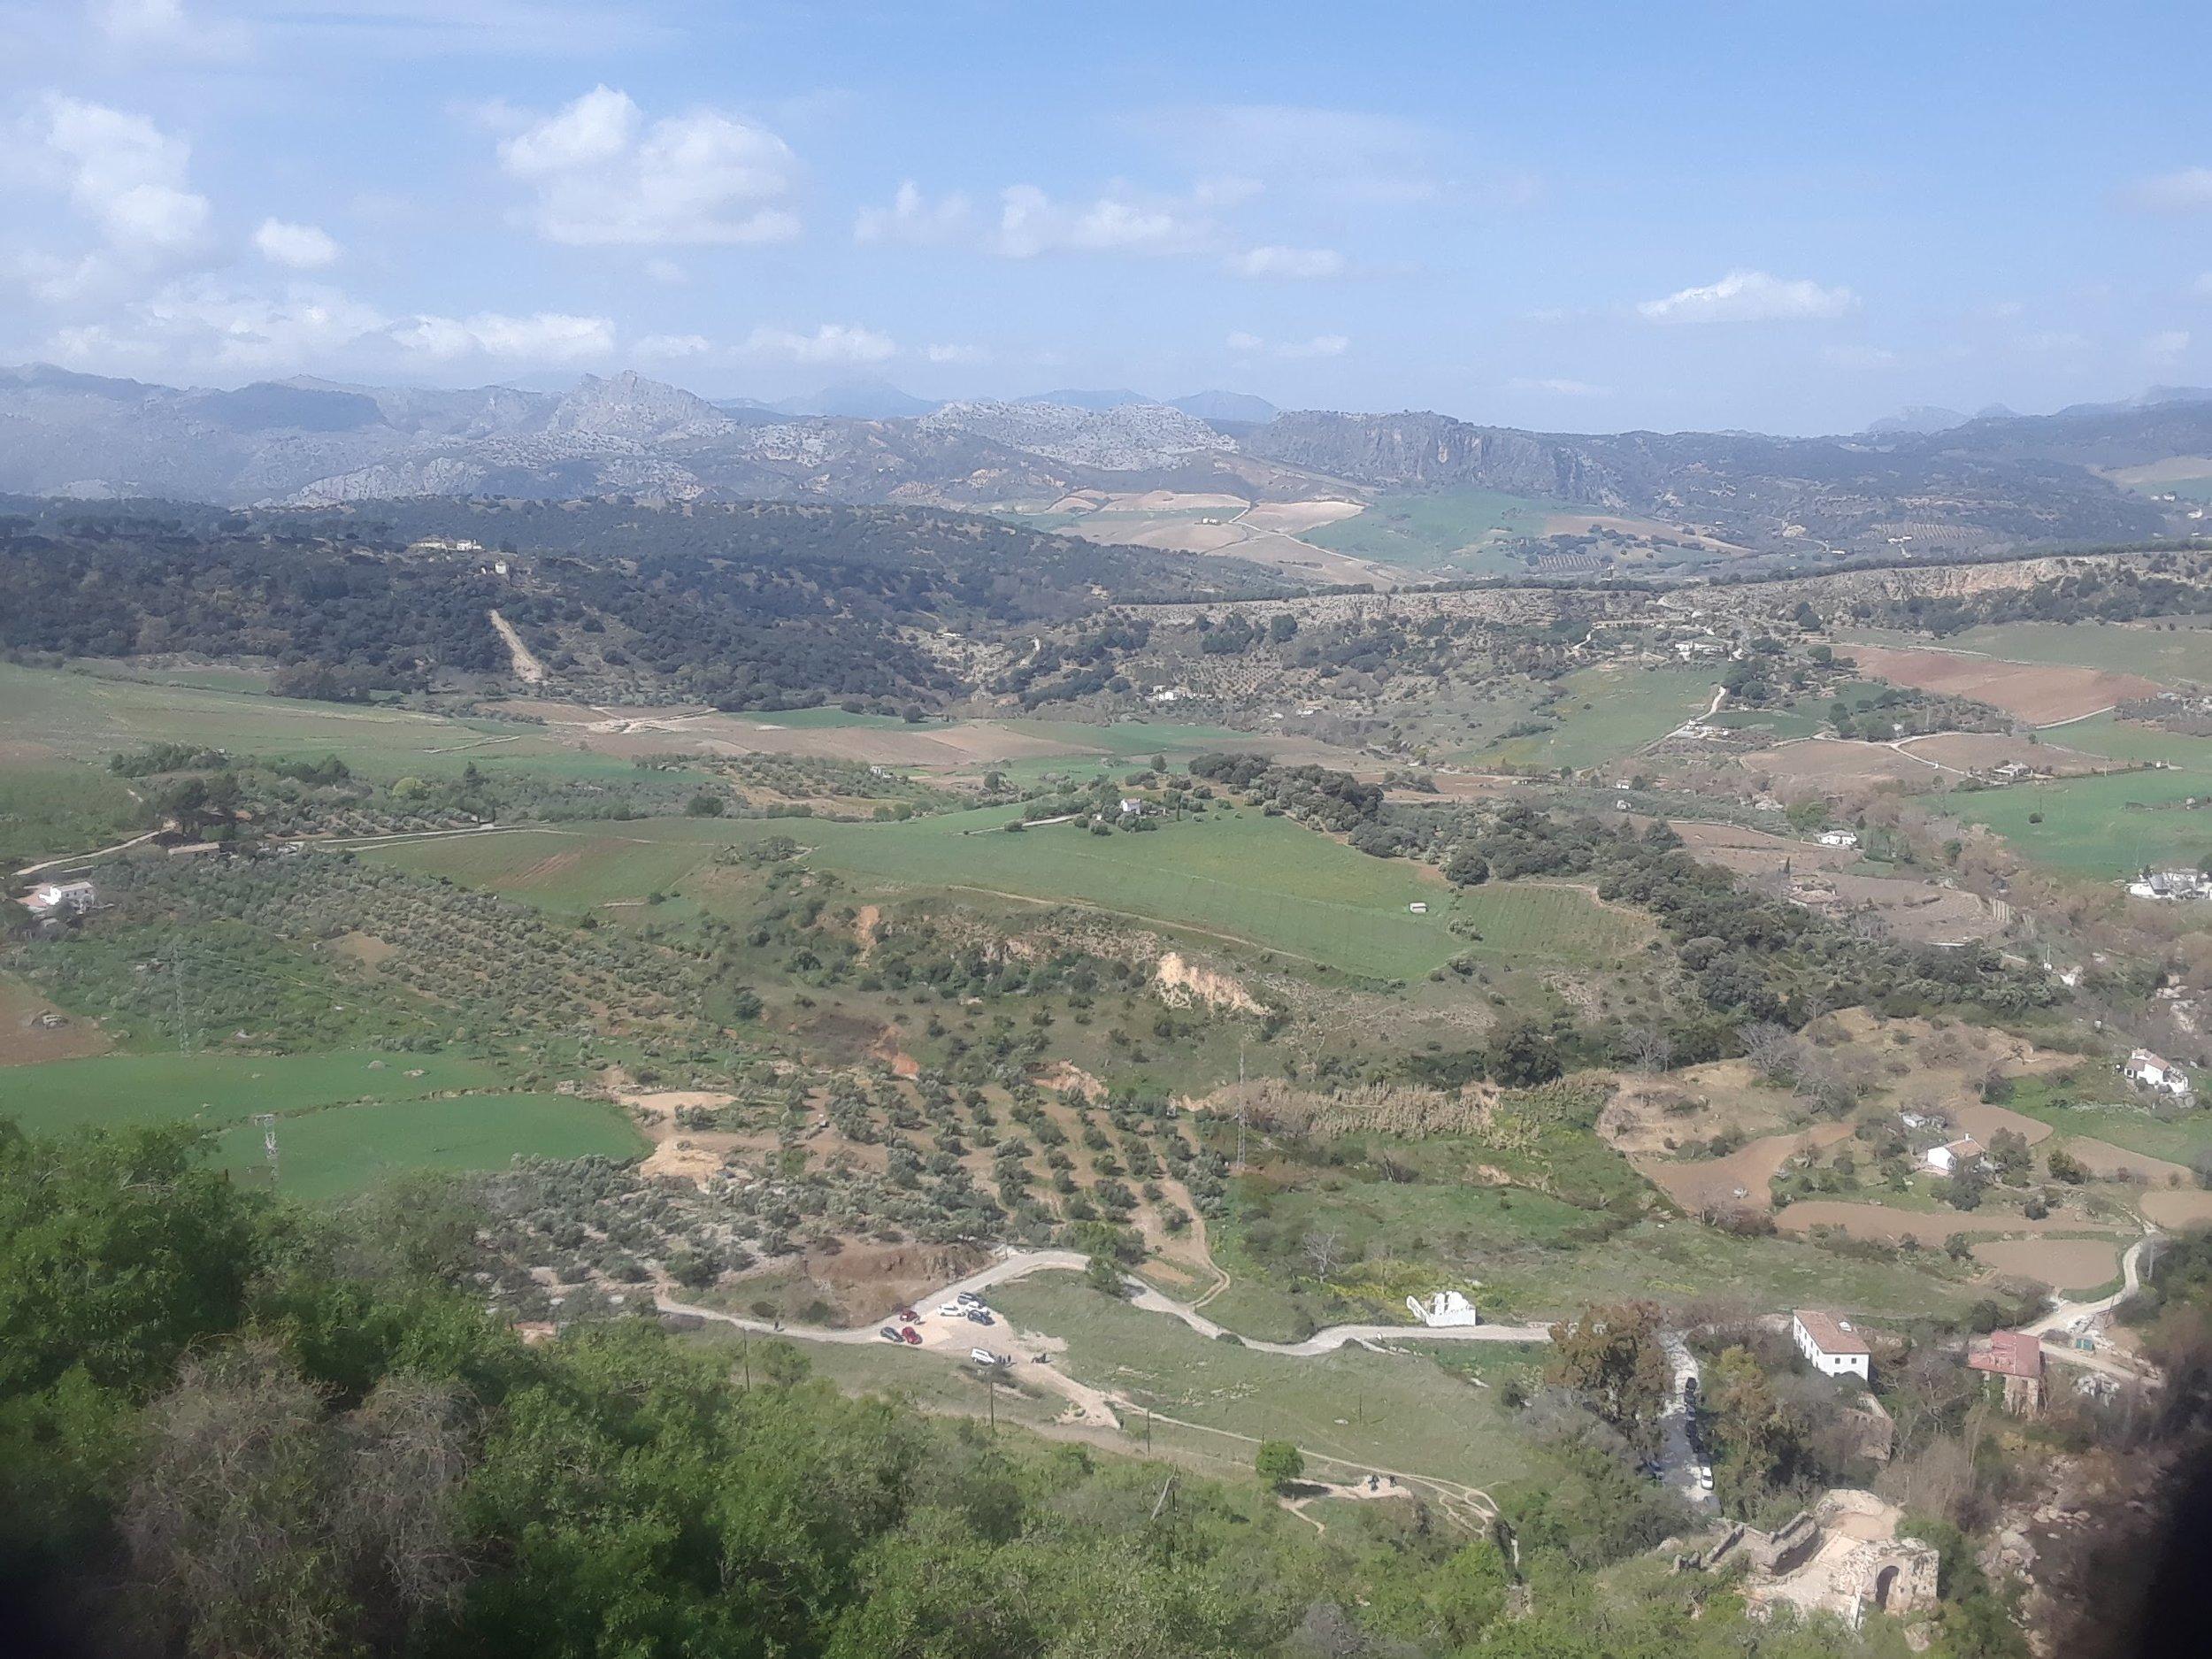 Views of Ronda